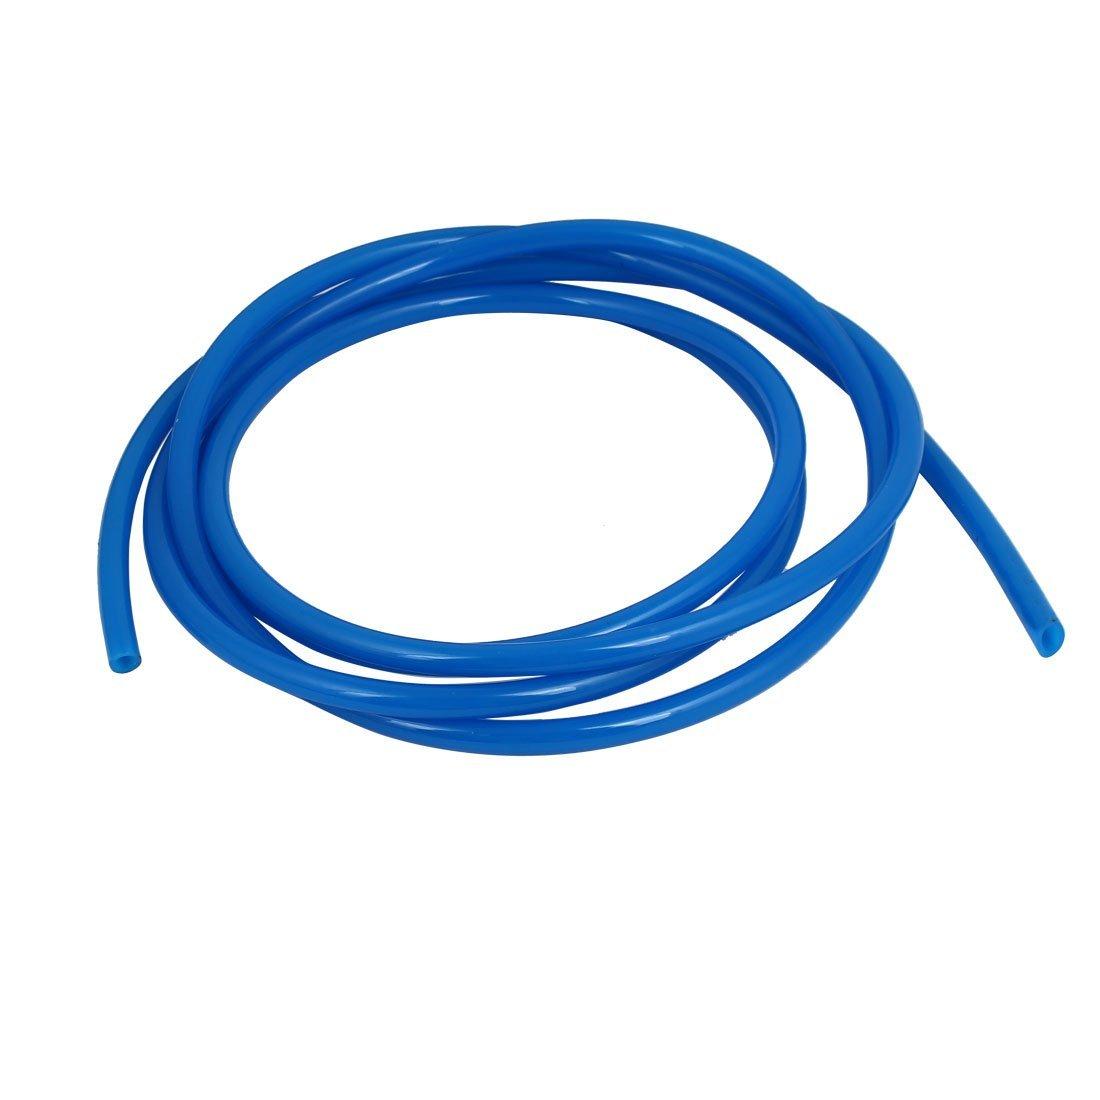 Gas line flexible tubing european plug adapter with usb